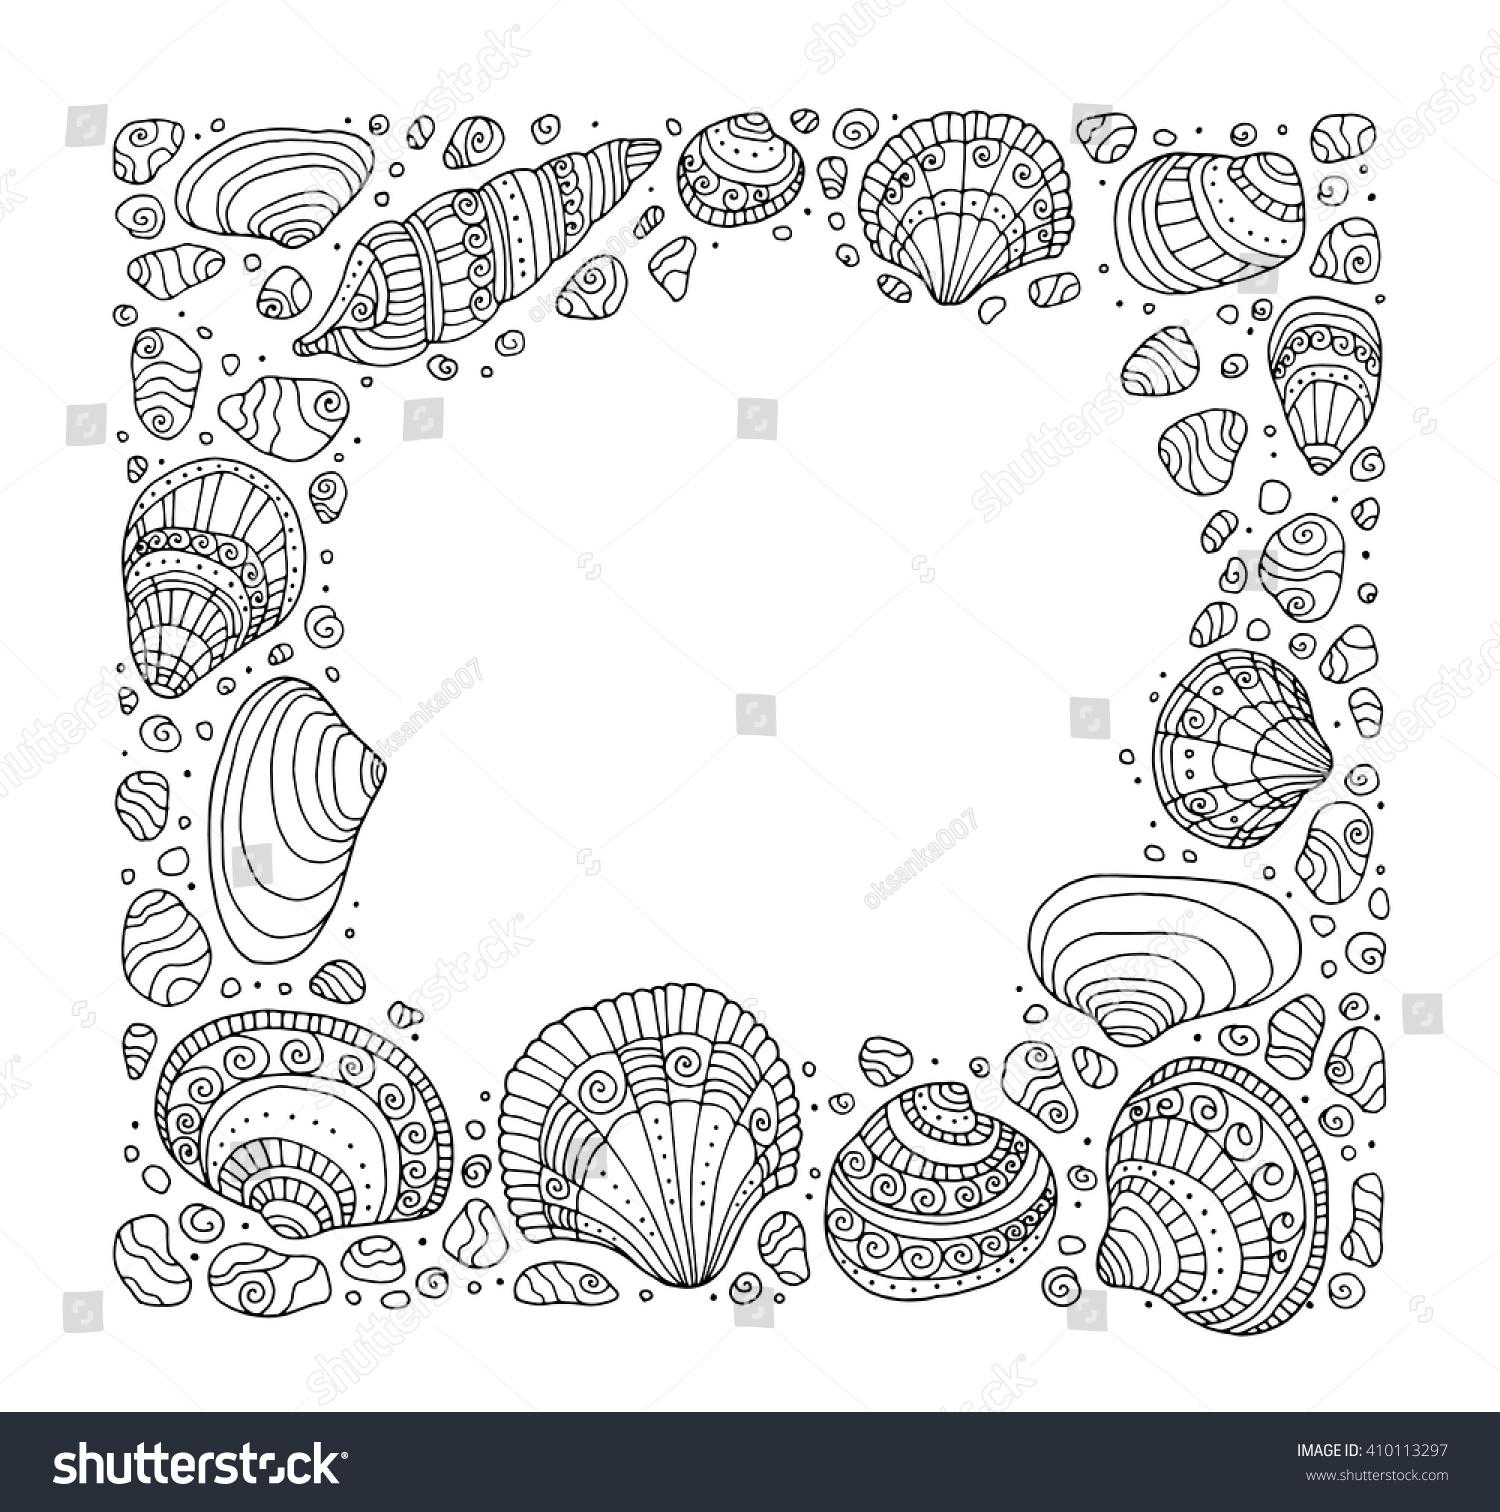 Zen ocean colouring book - Seashell Border Frame Ocean Pattern Vector Seashell Illustration Zentangle Seashell Coloring Book